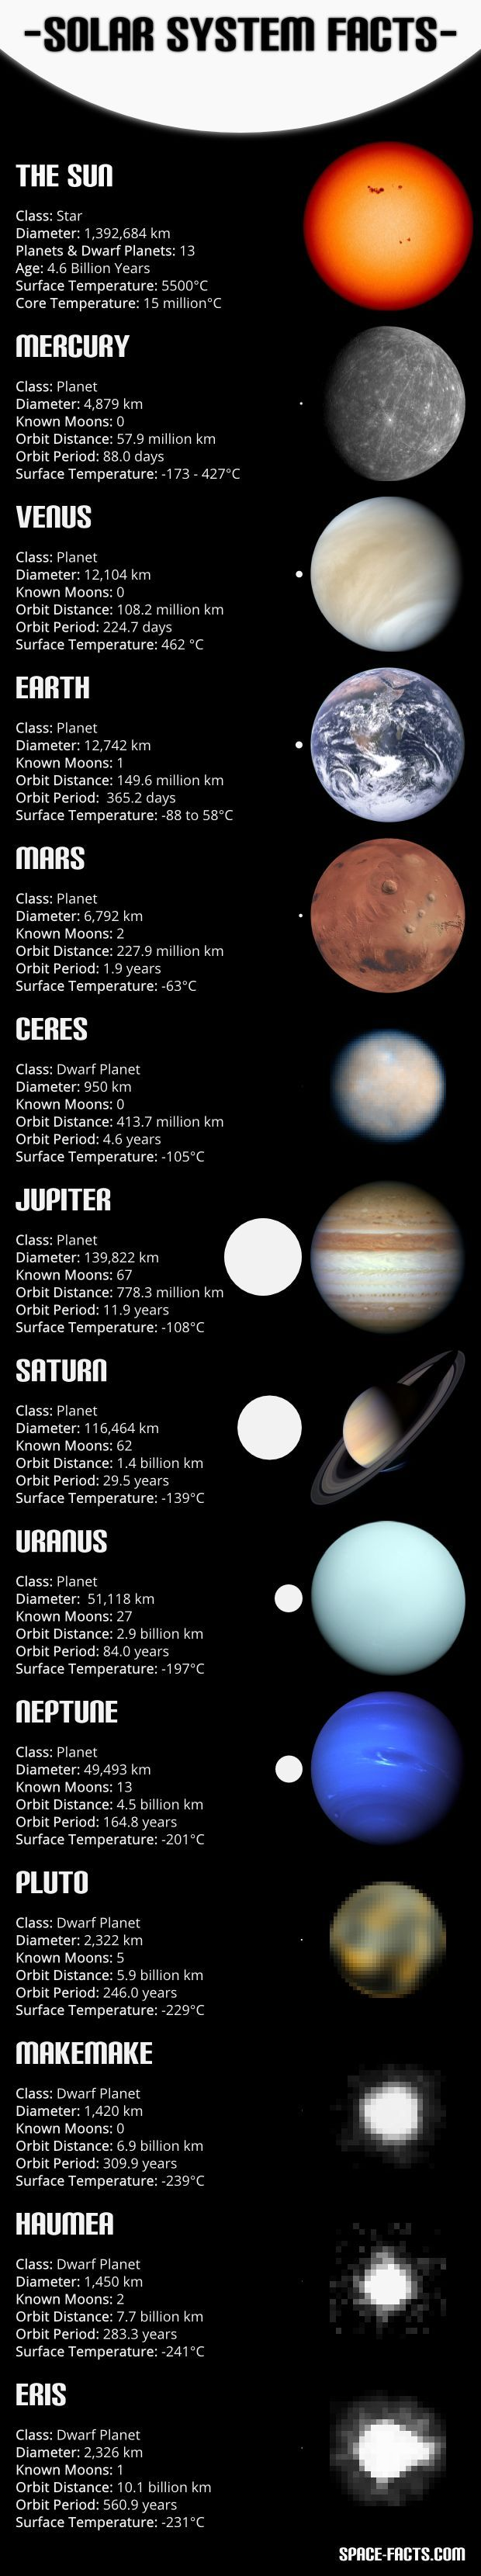 Solar system facts   SPACE   LET'S GO!   Pinterest